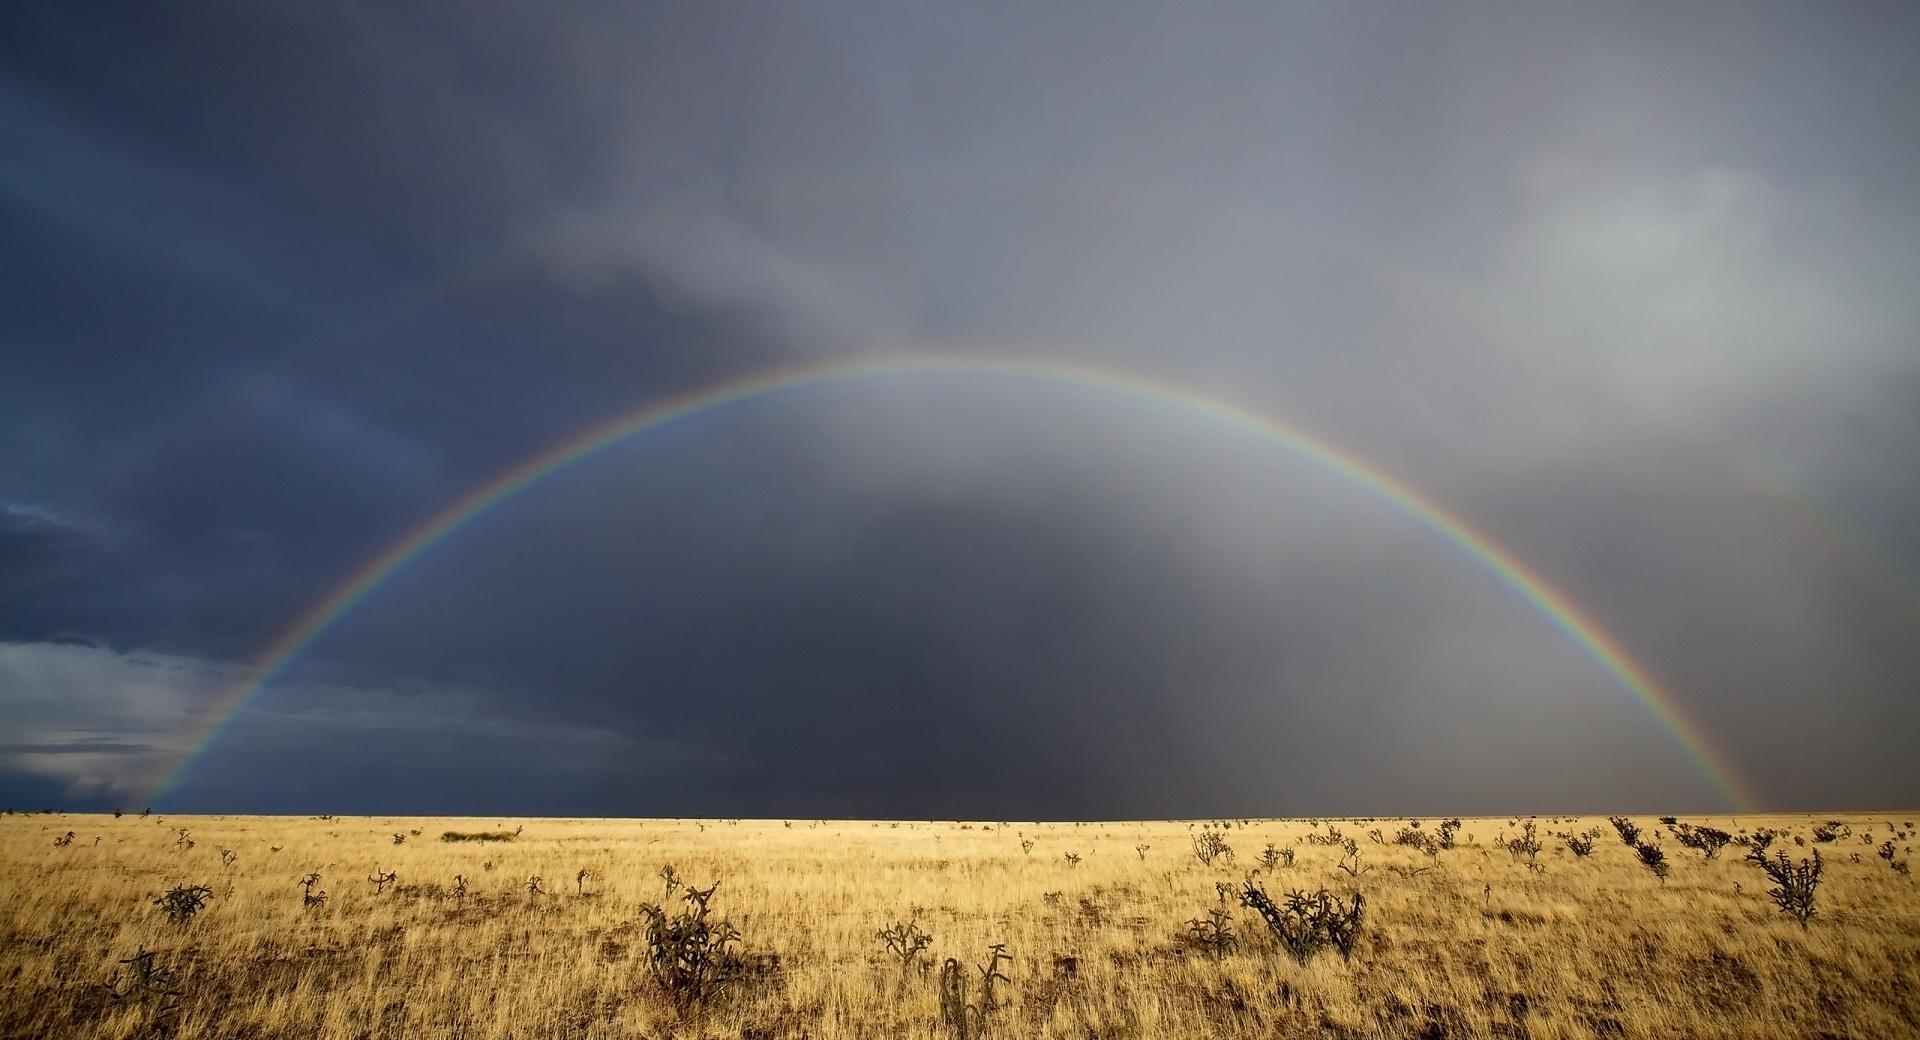 Desert Rainbow wallpapers HD quality